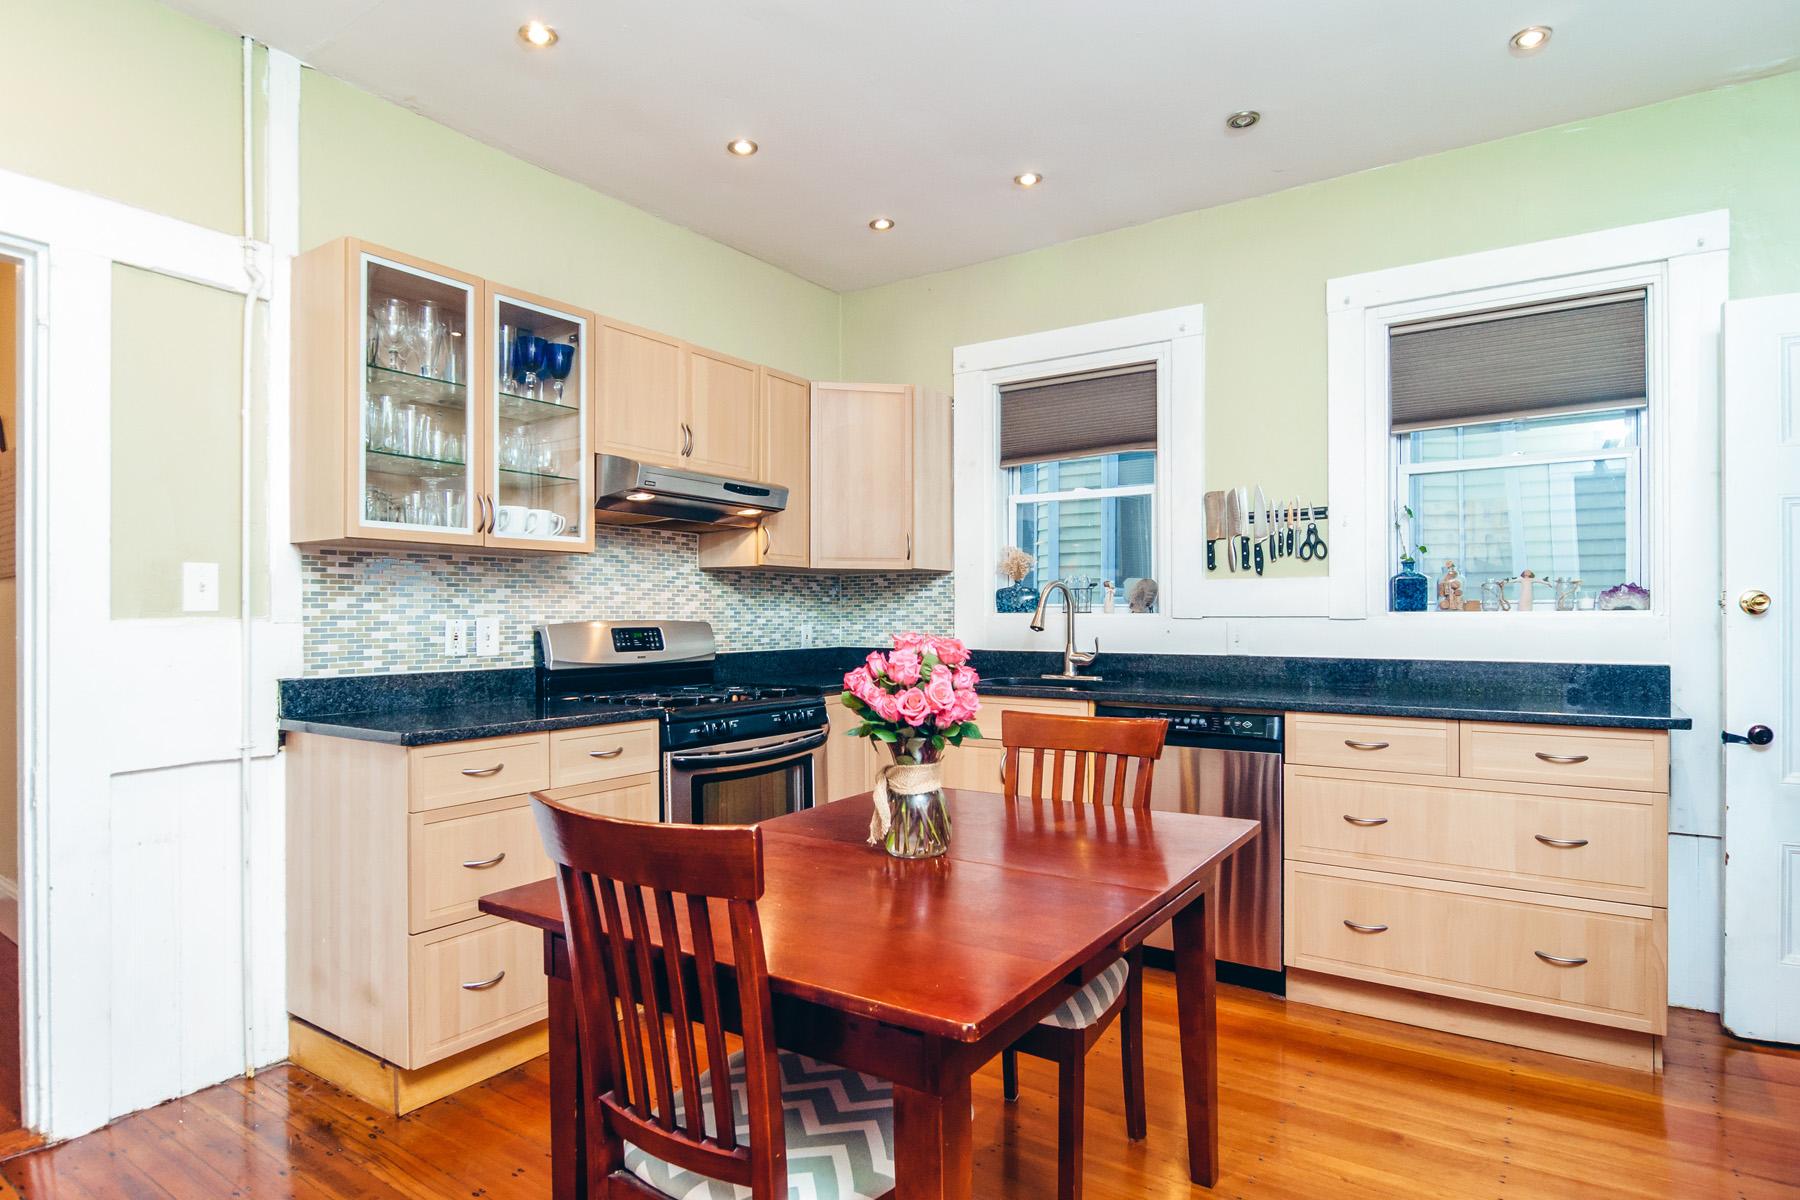 Condominium for Sale at 37 Weld Hill St 1, Boston 37 Weld Hill St #1 Boston, Massachusetts, 02130 United States